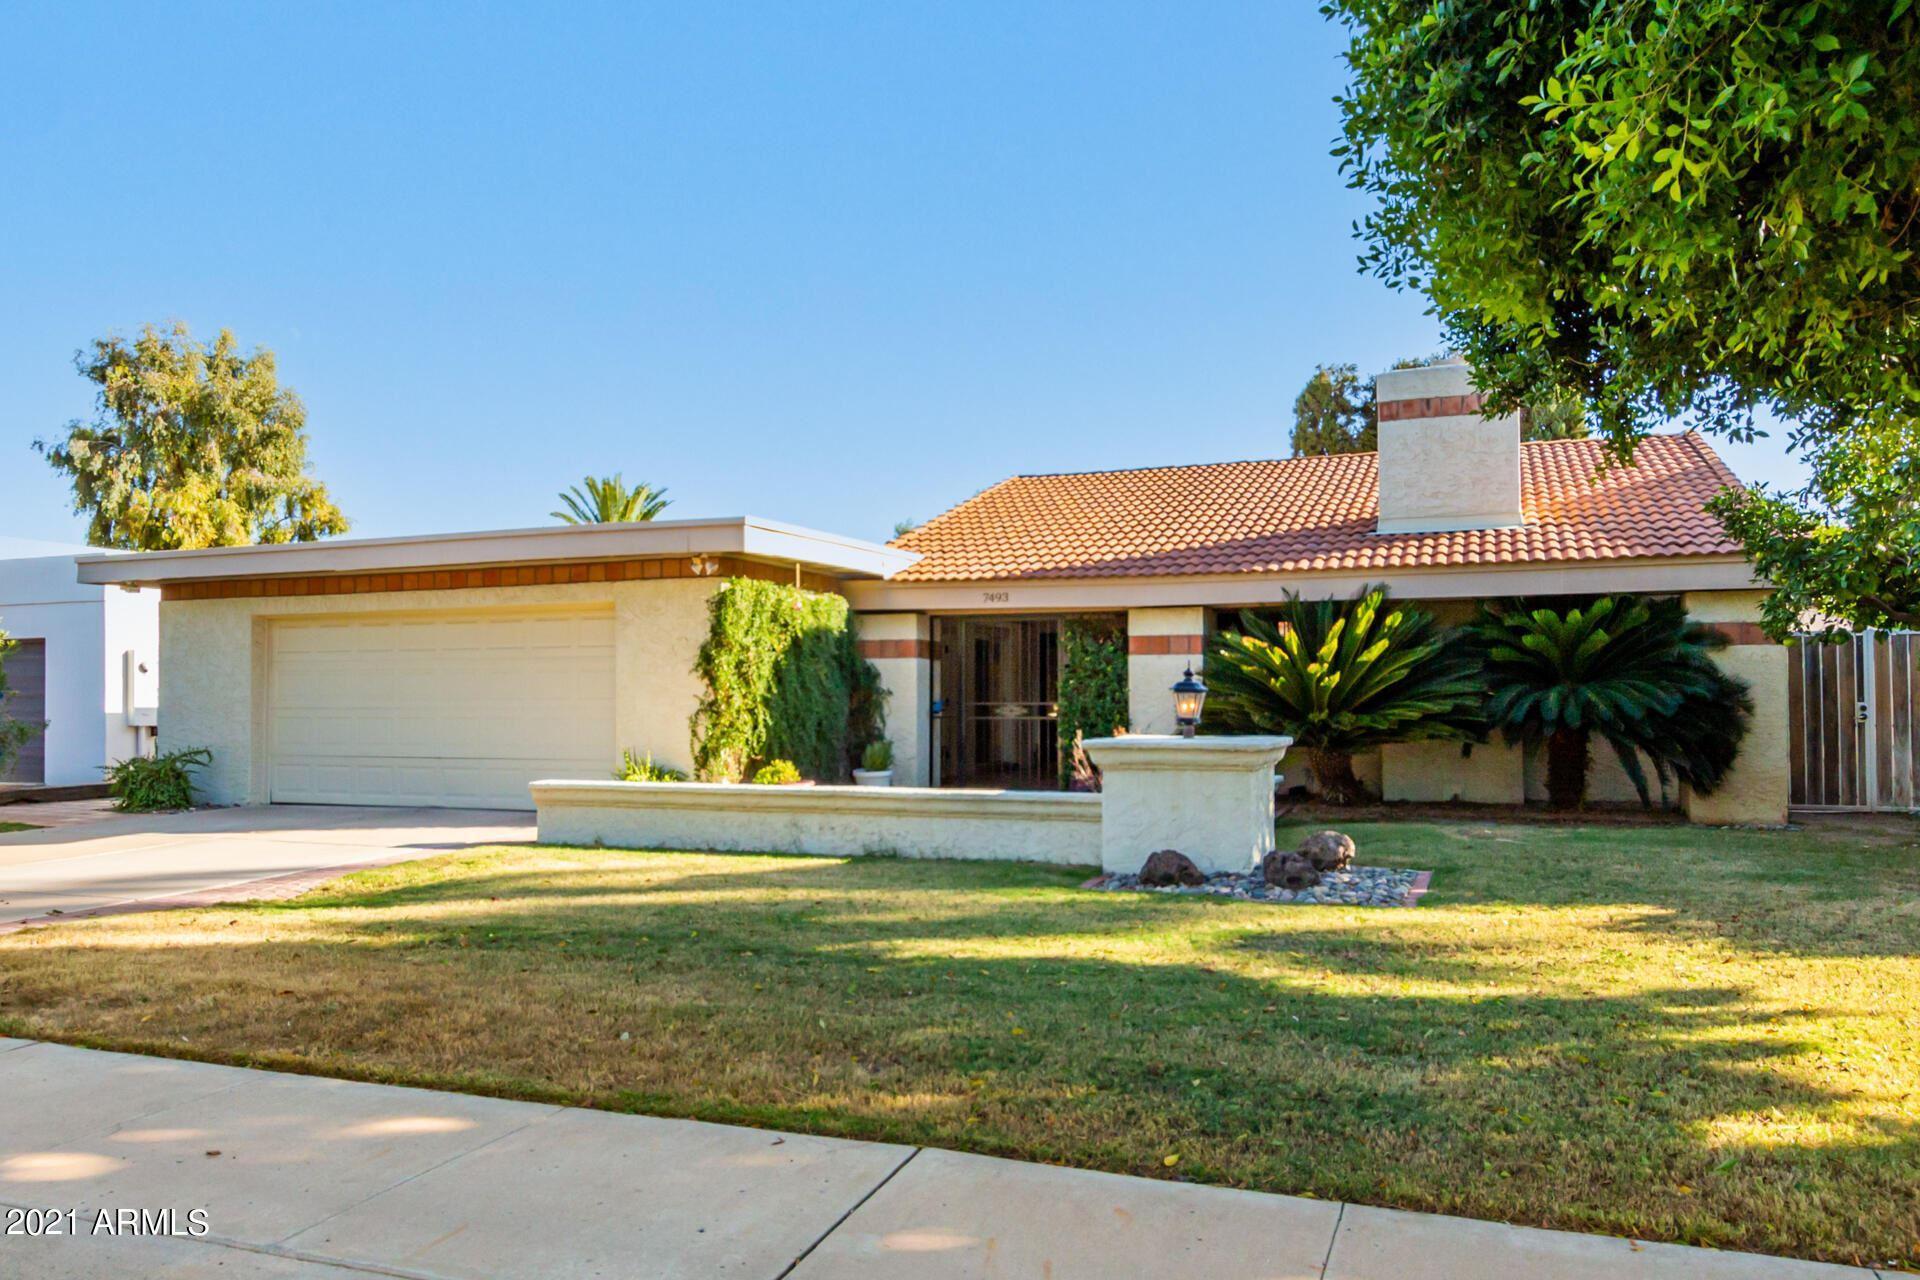 Photo of 7493 E TIMBERLANE Court, Scottsdale, AZ 85258 (MLS # 6307701)